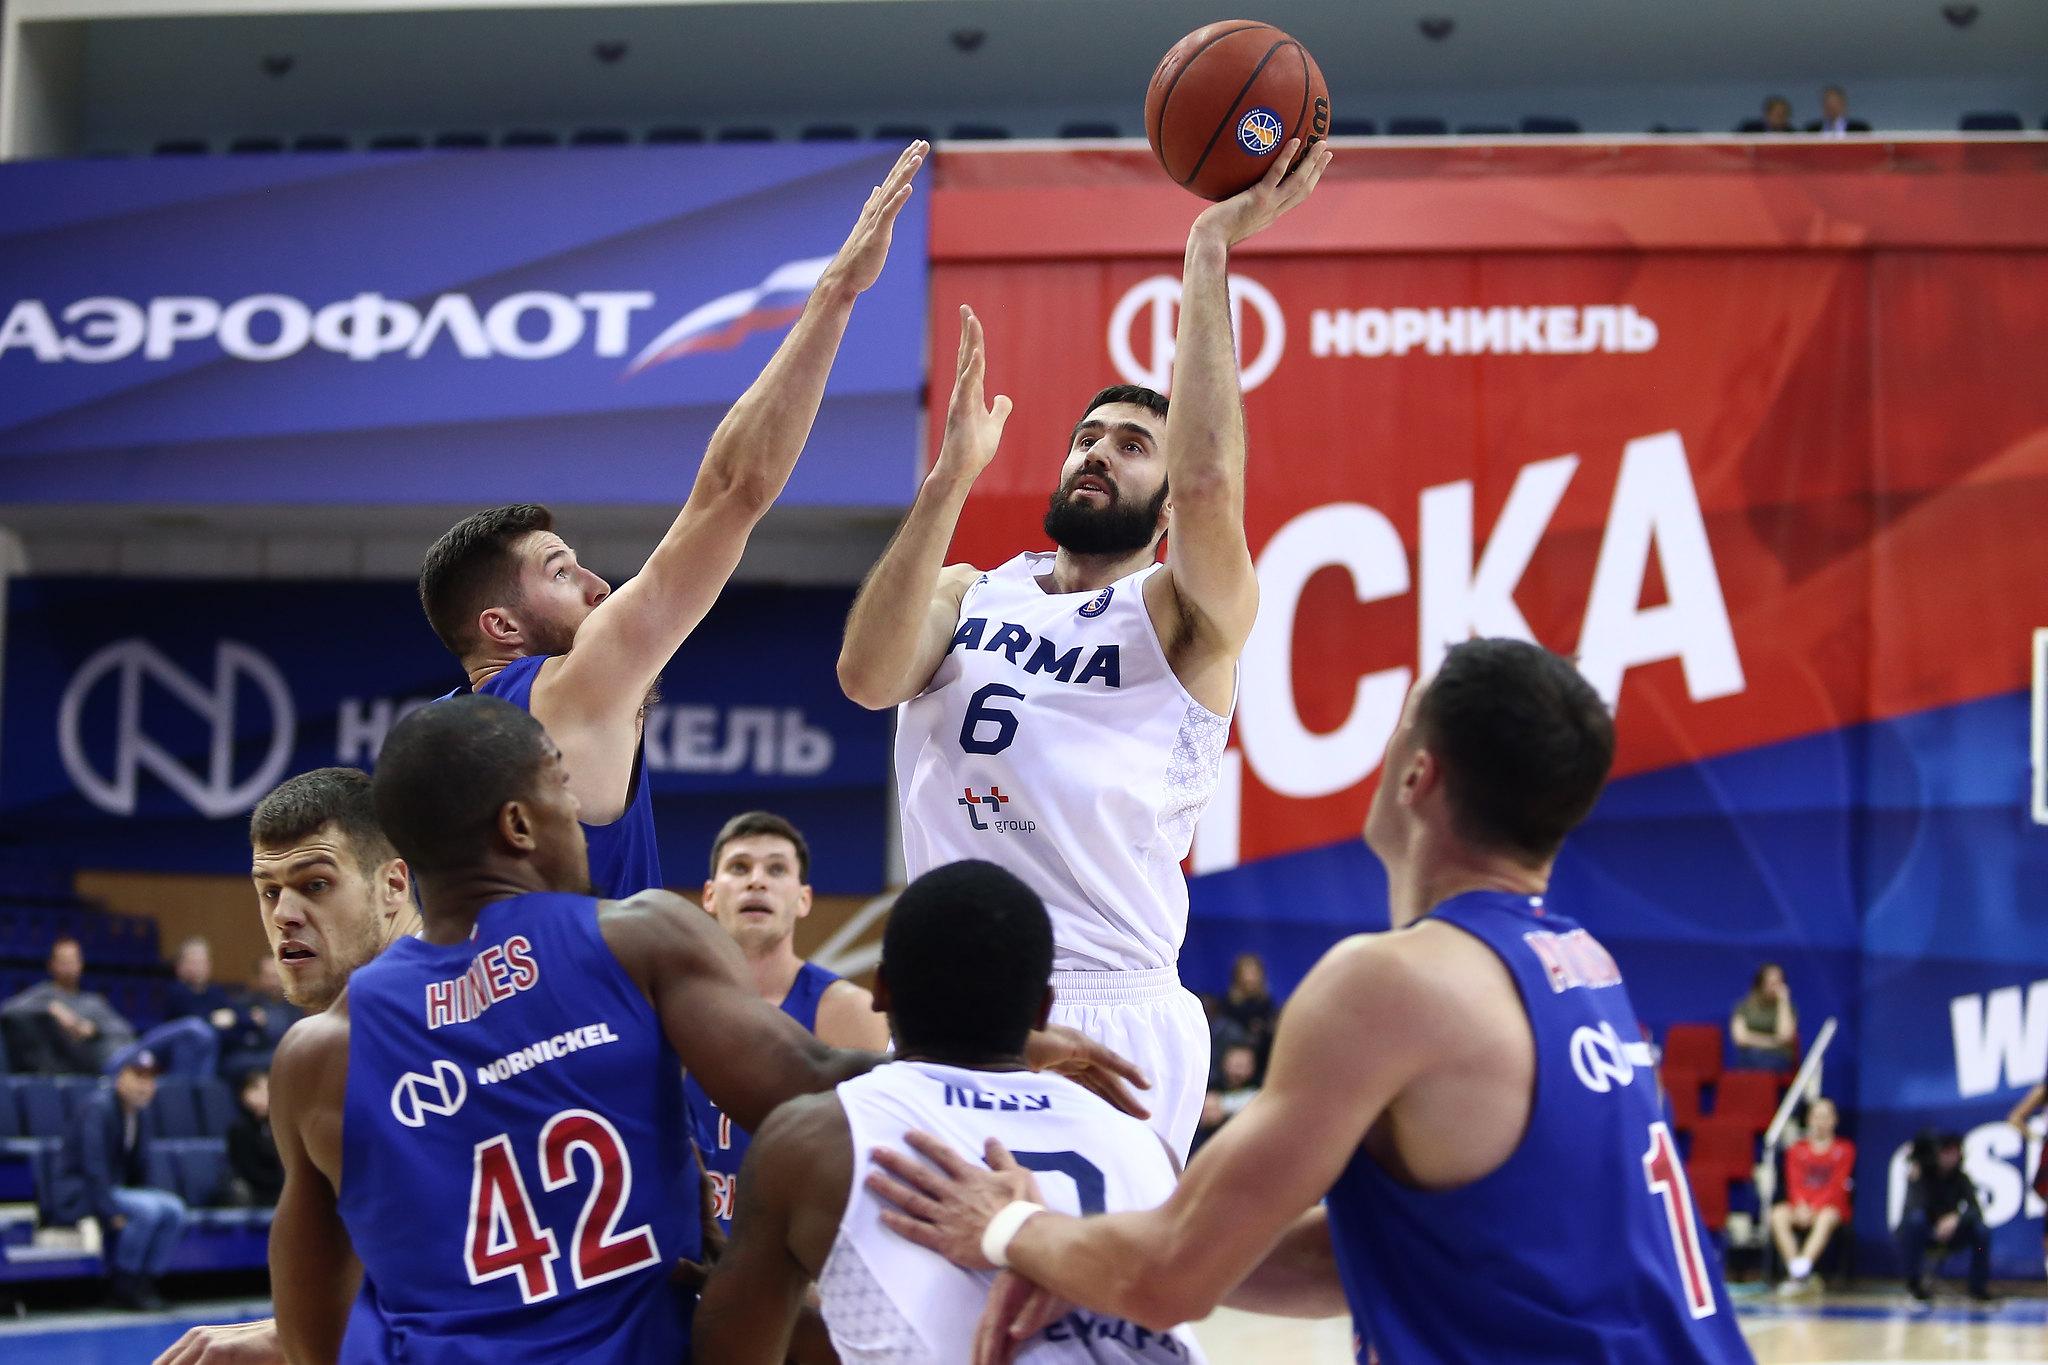 29/10/2018 CSKA-PARMA 108:84